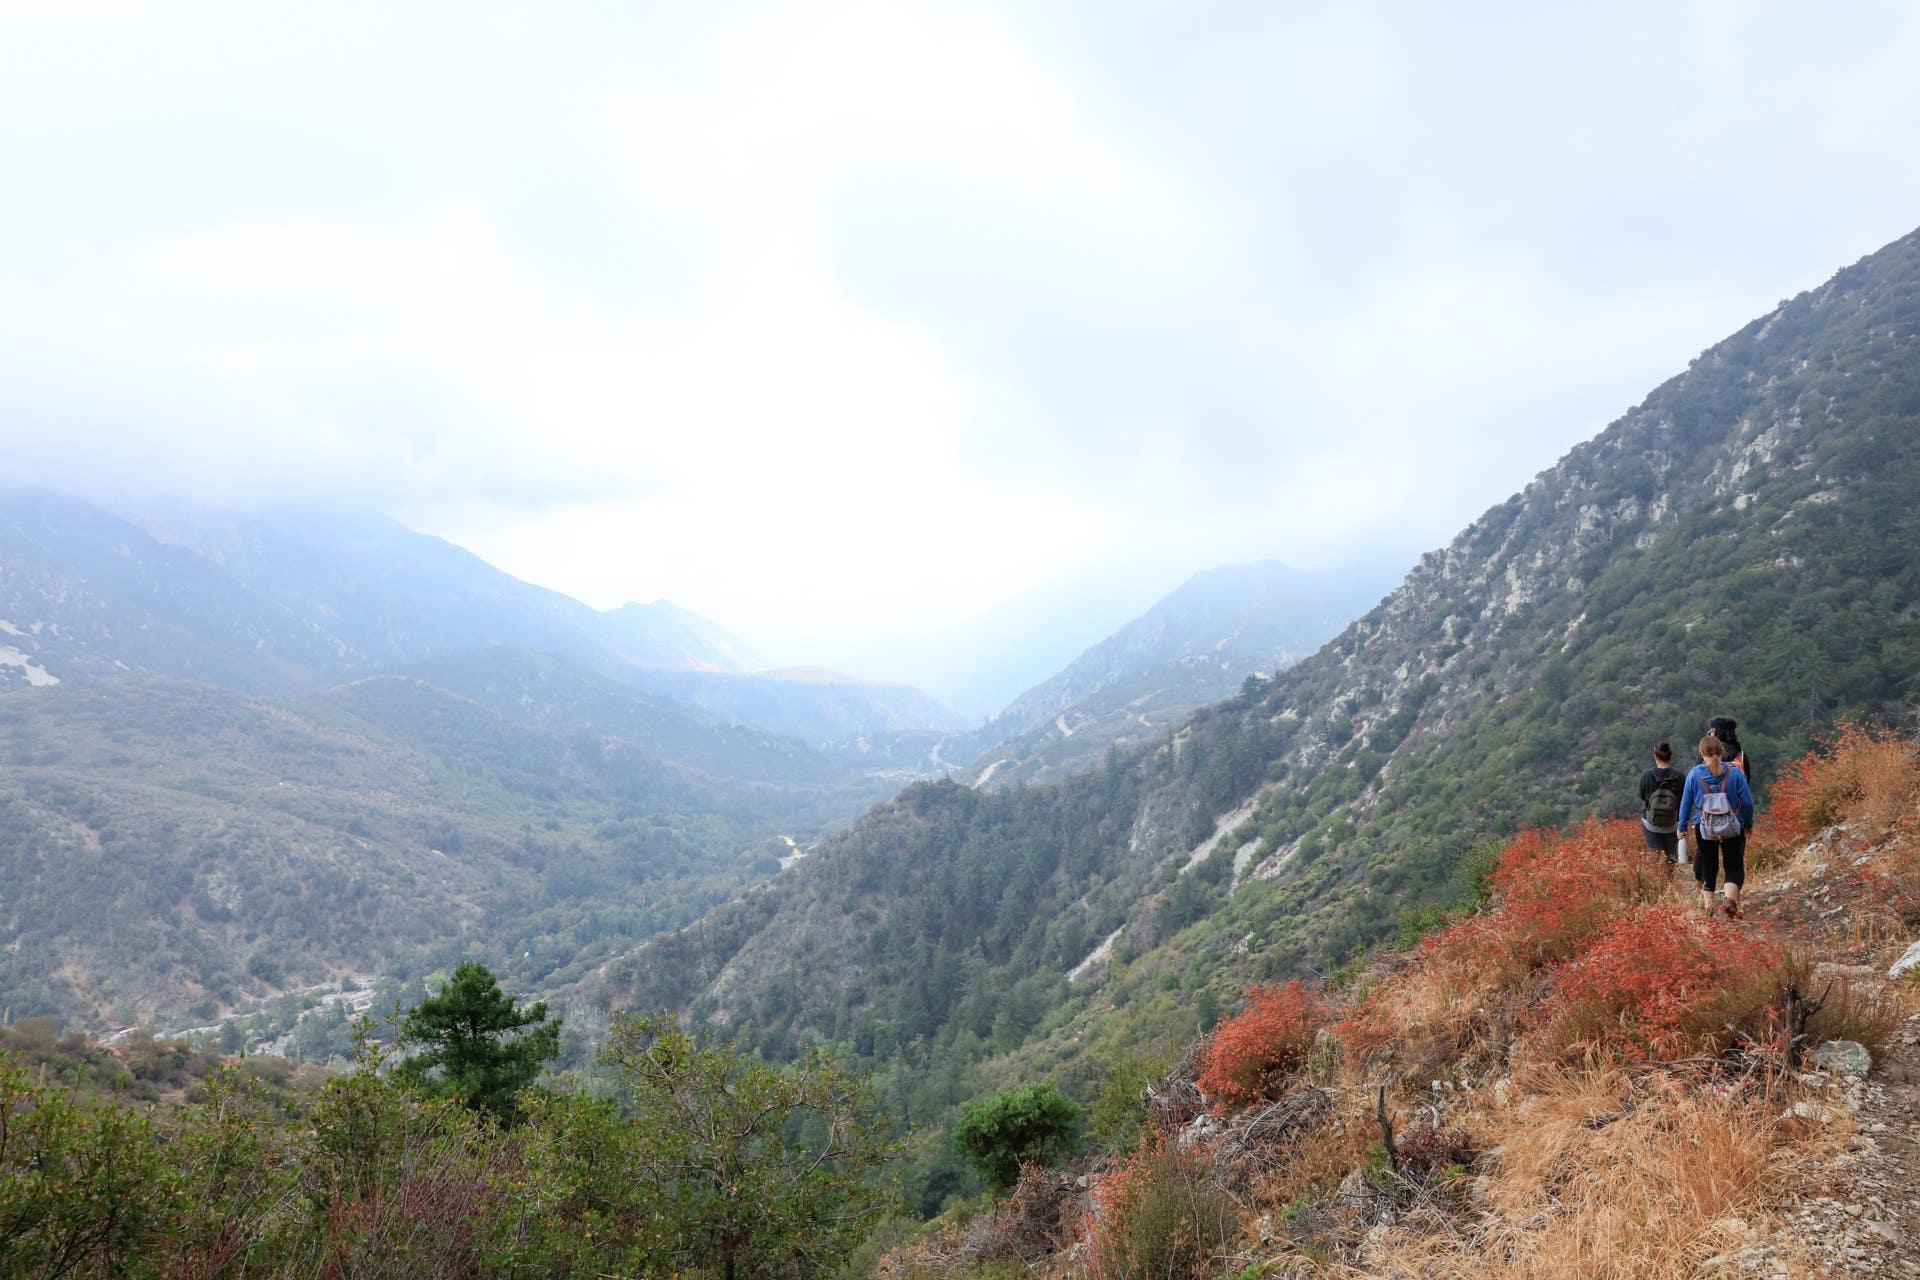 Hiking Bear Canyon Trail (aka Old Mt. Baldy Trail)